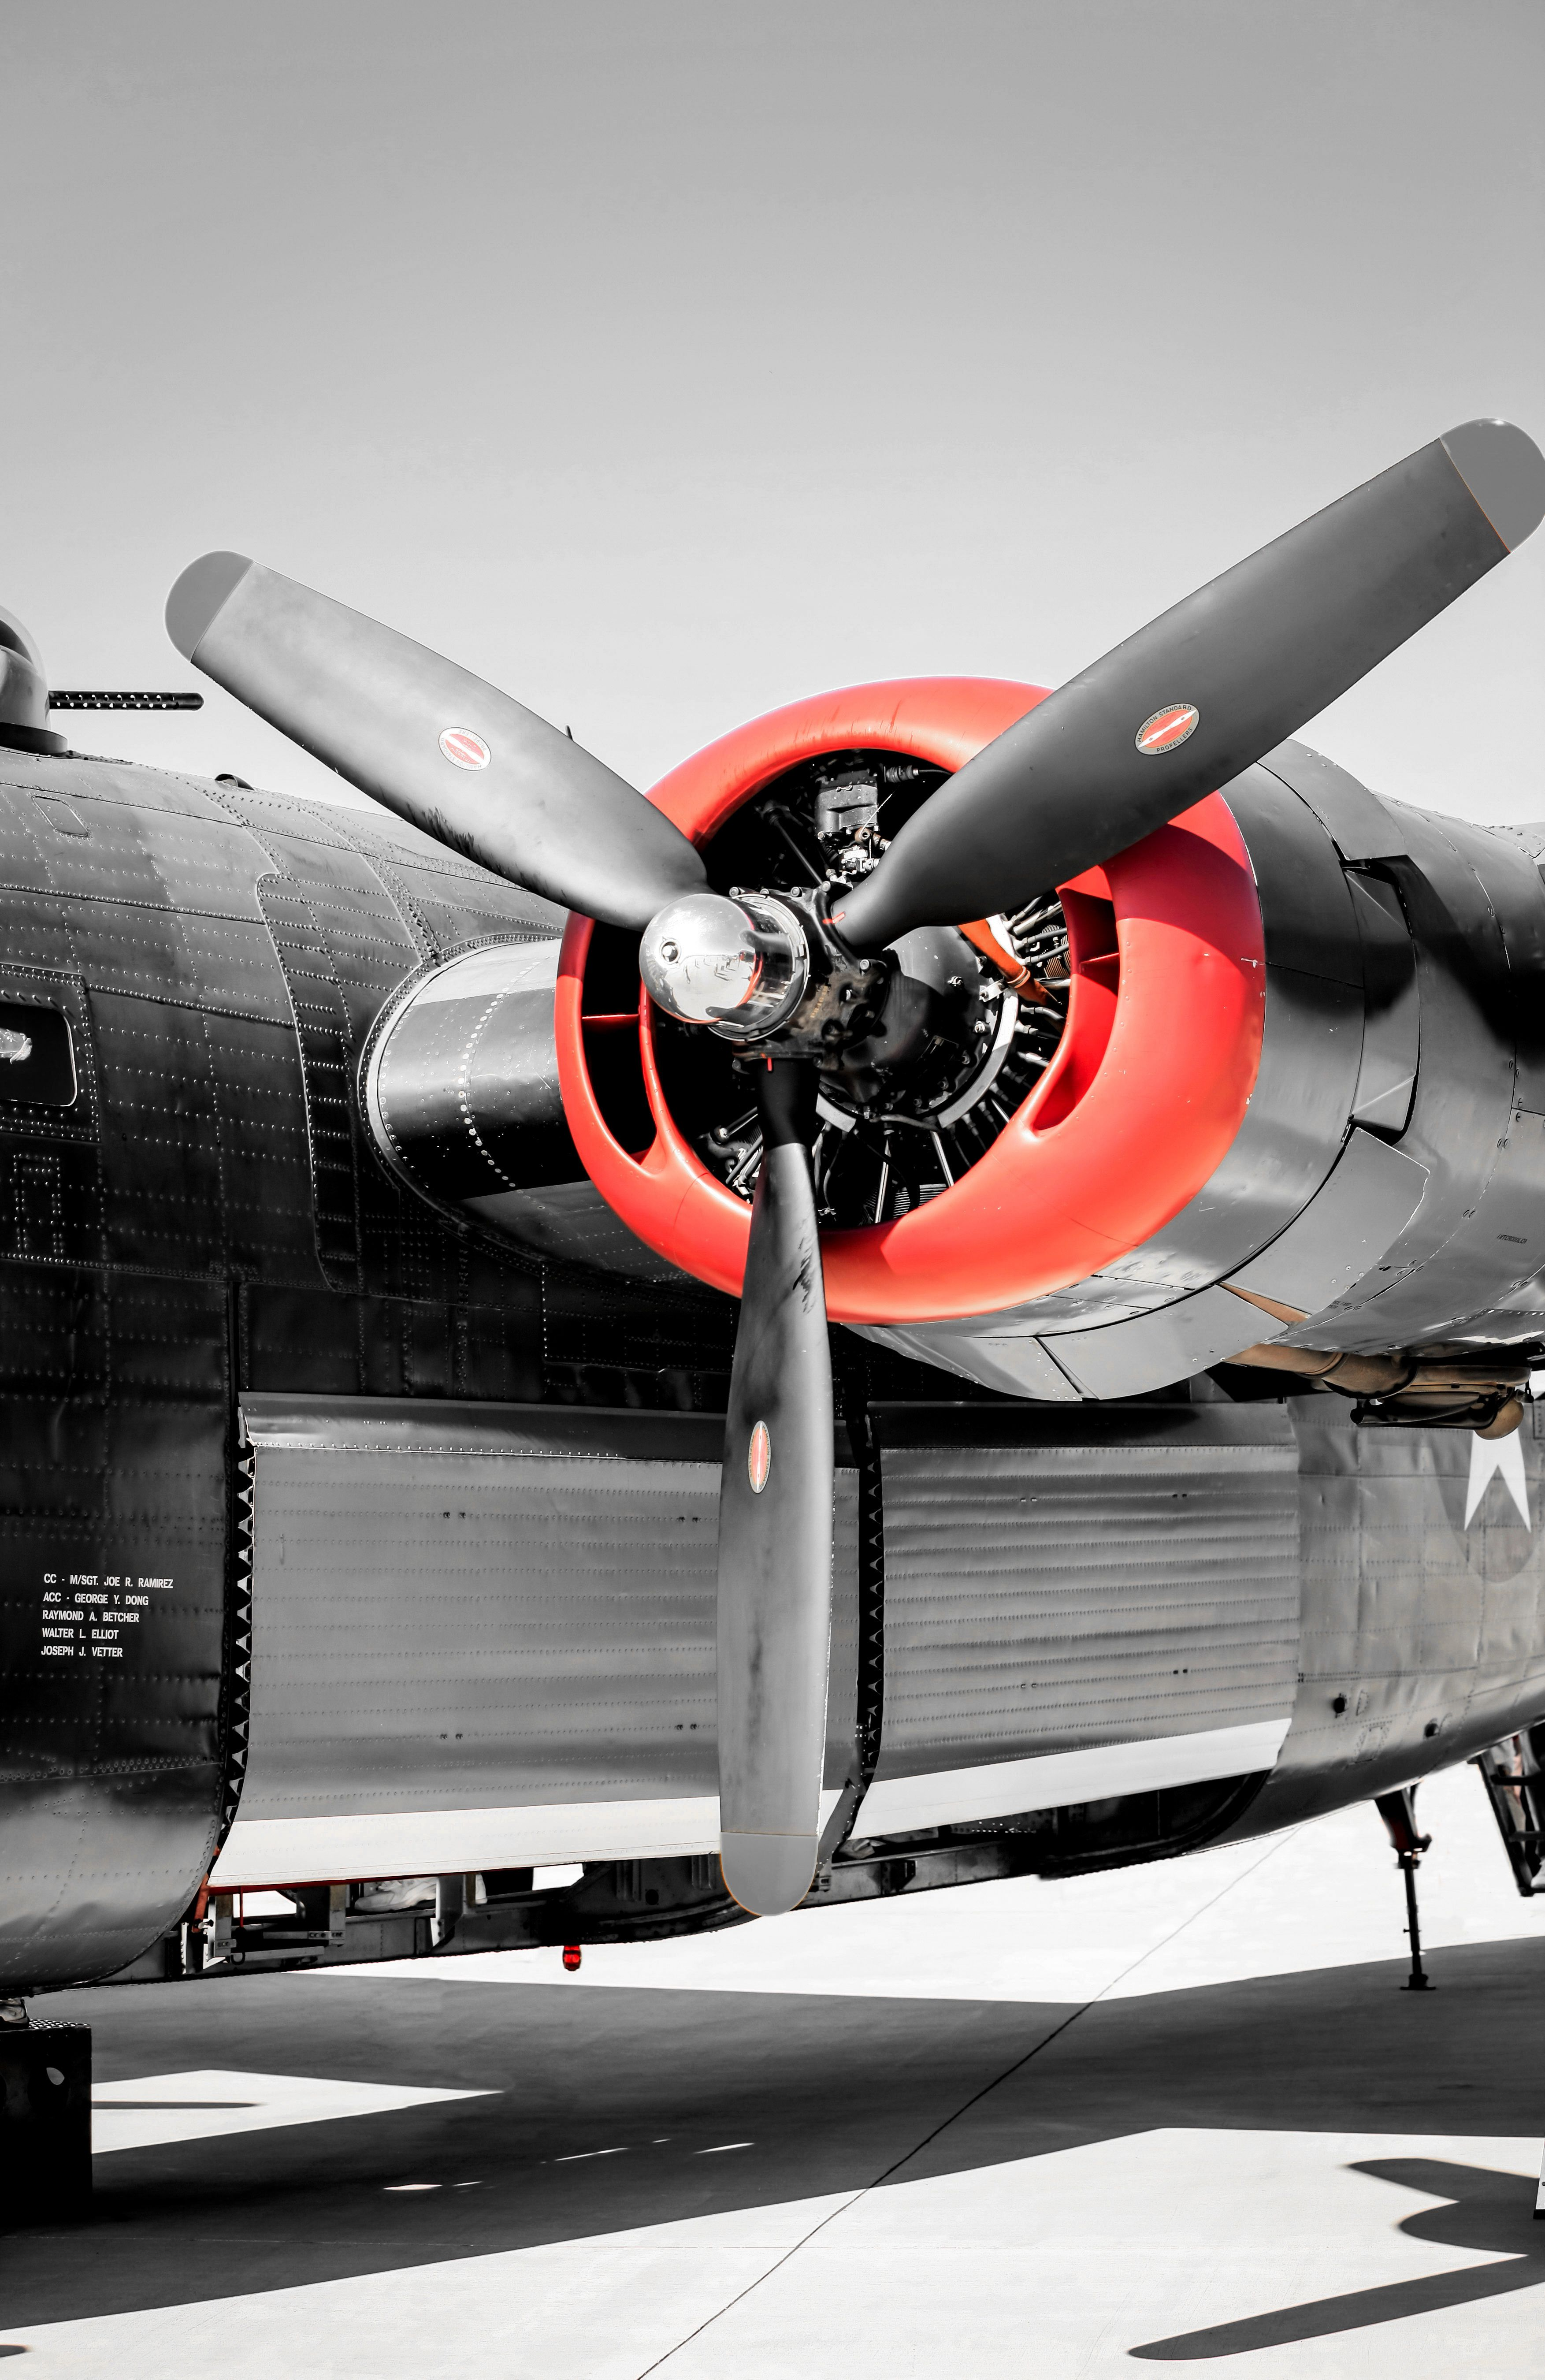 b24 pratt whitney radial engine vintage aviation wall decor